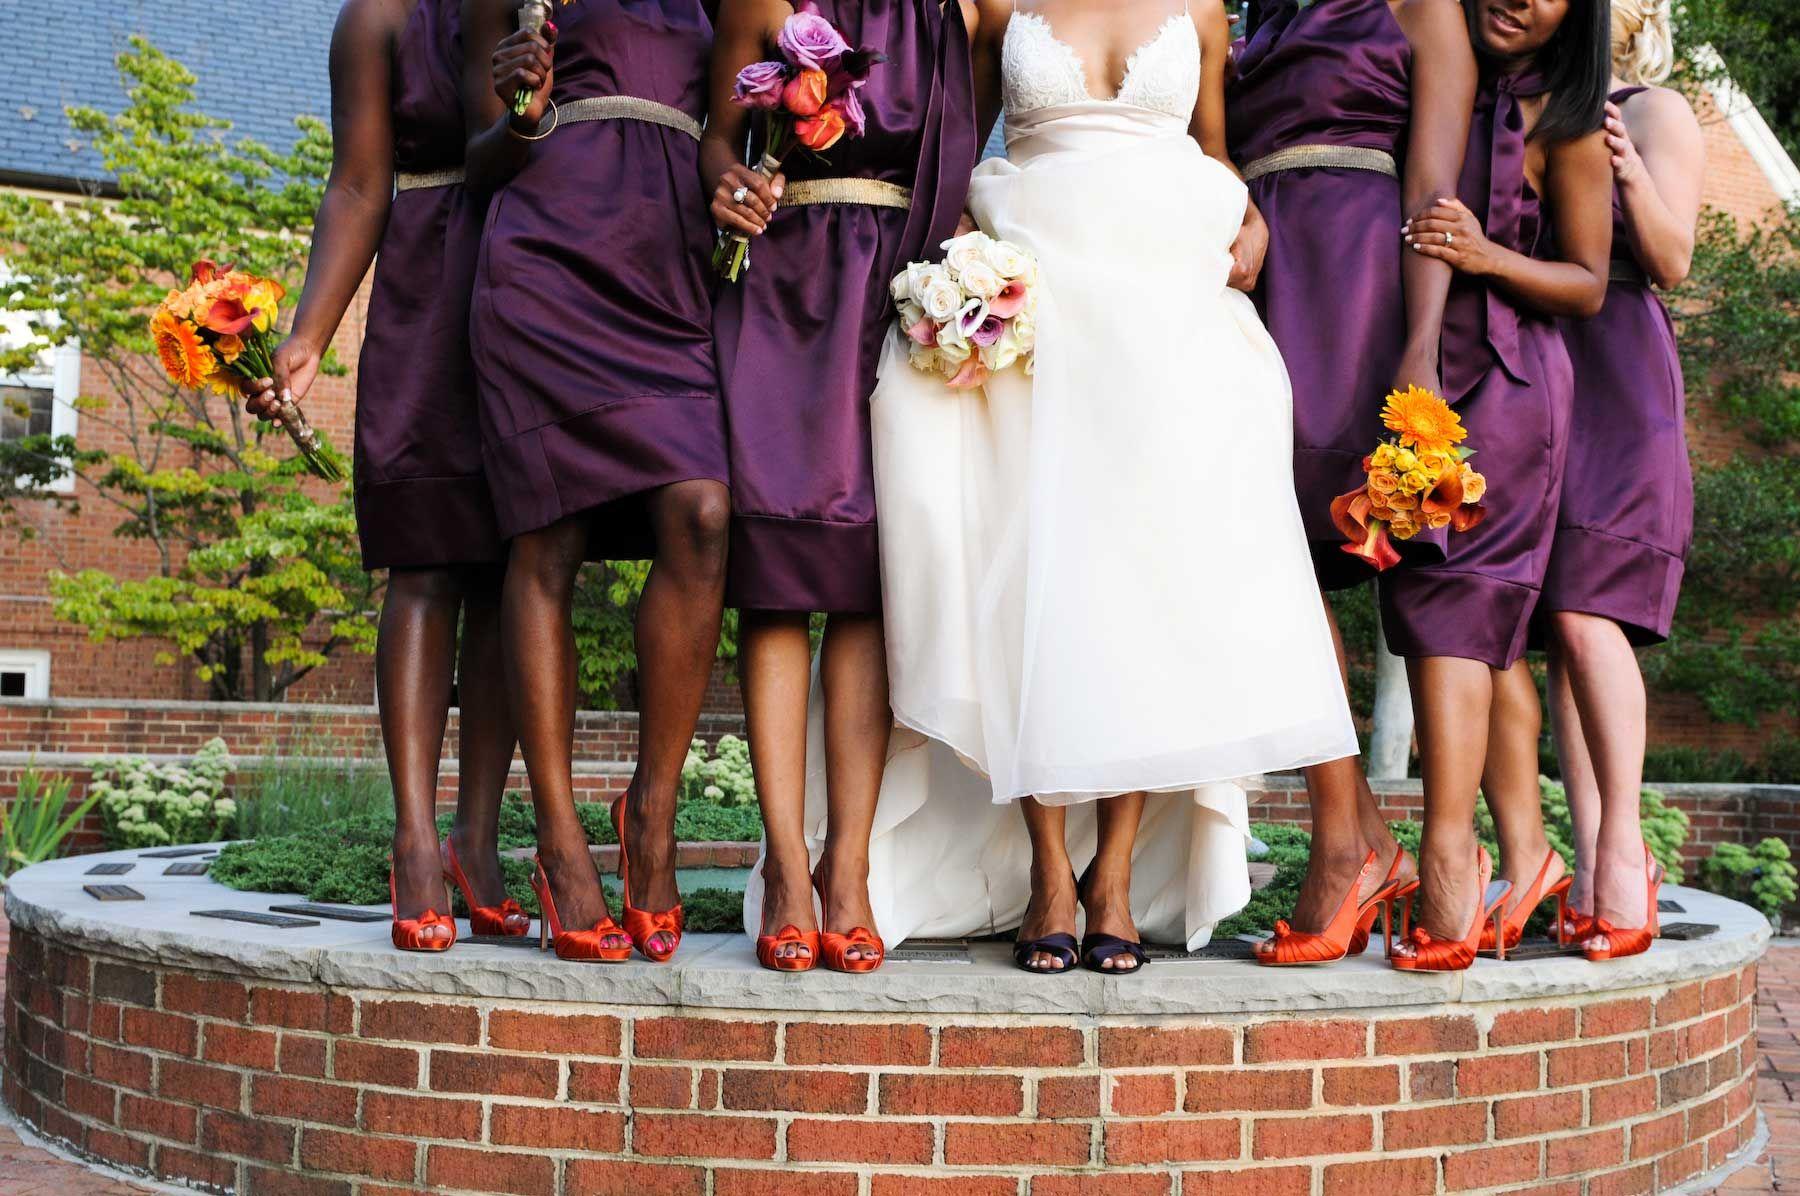 Real Weddings Sonya Janssen 8 31 08 Elizabeth Anne Designs The Wedding Blog Orange Wedding Themes October Wedding Colors Purple Wedding [ 1196 x 1800 Pixel ]